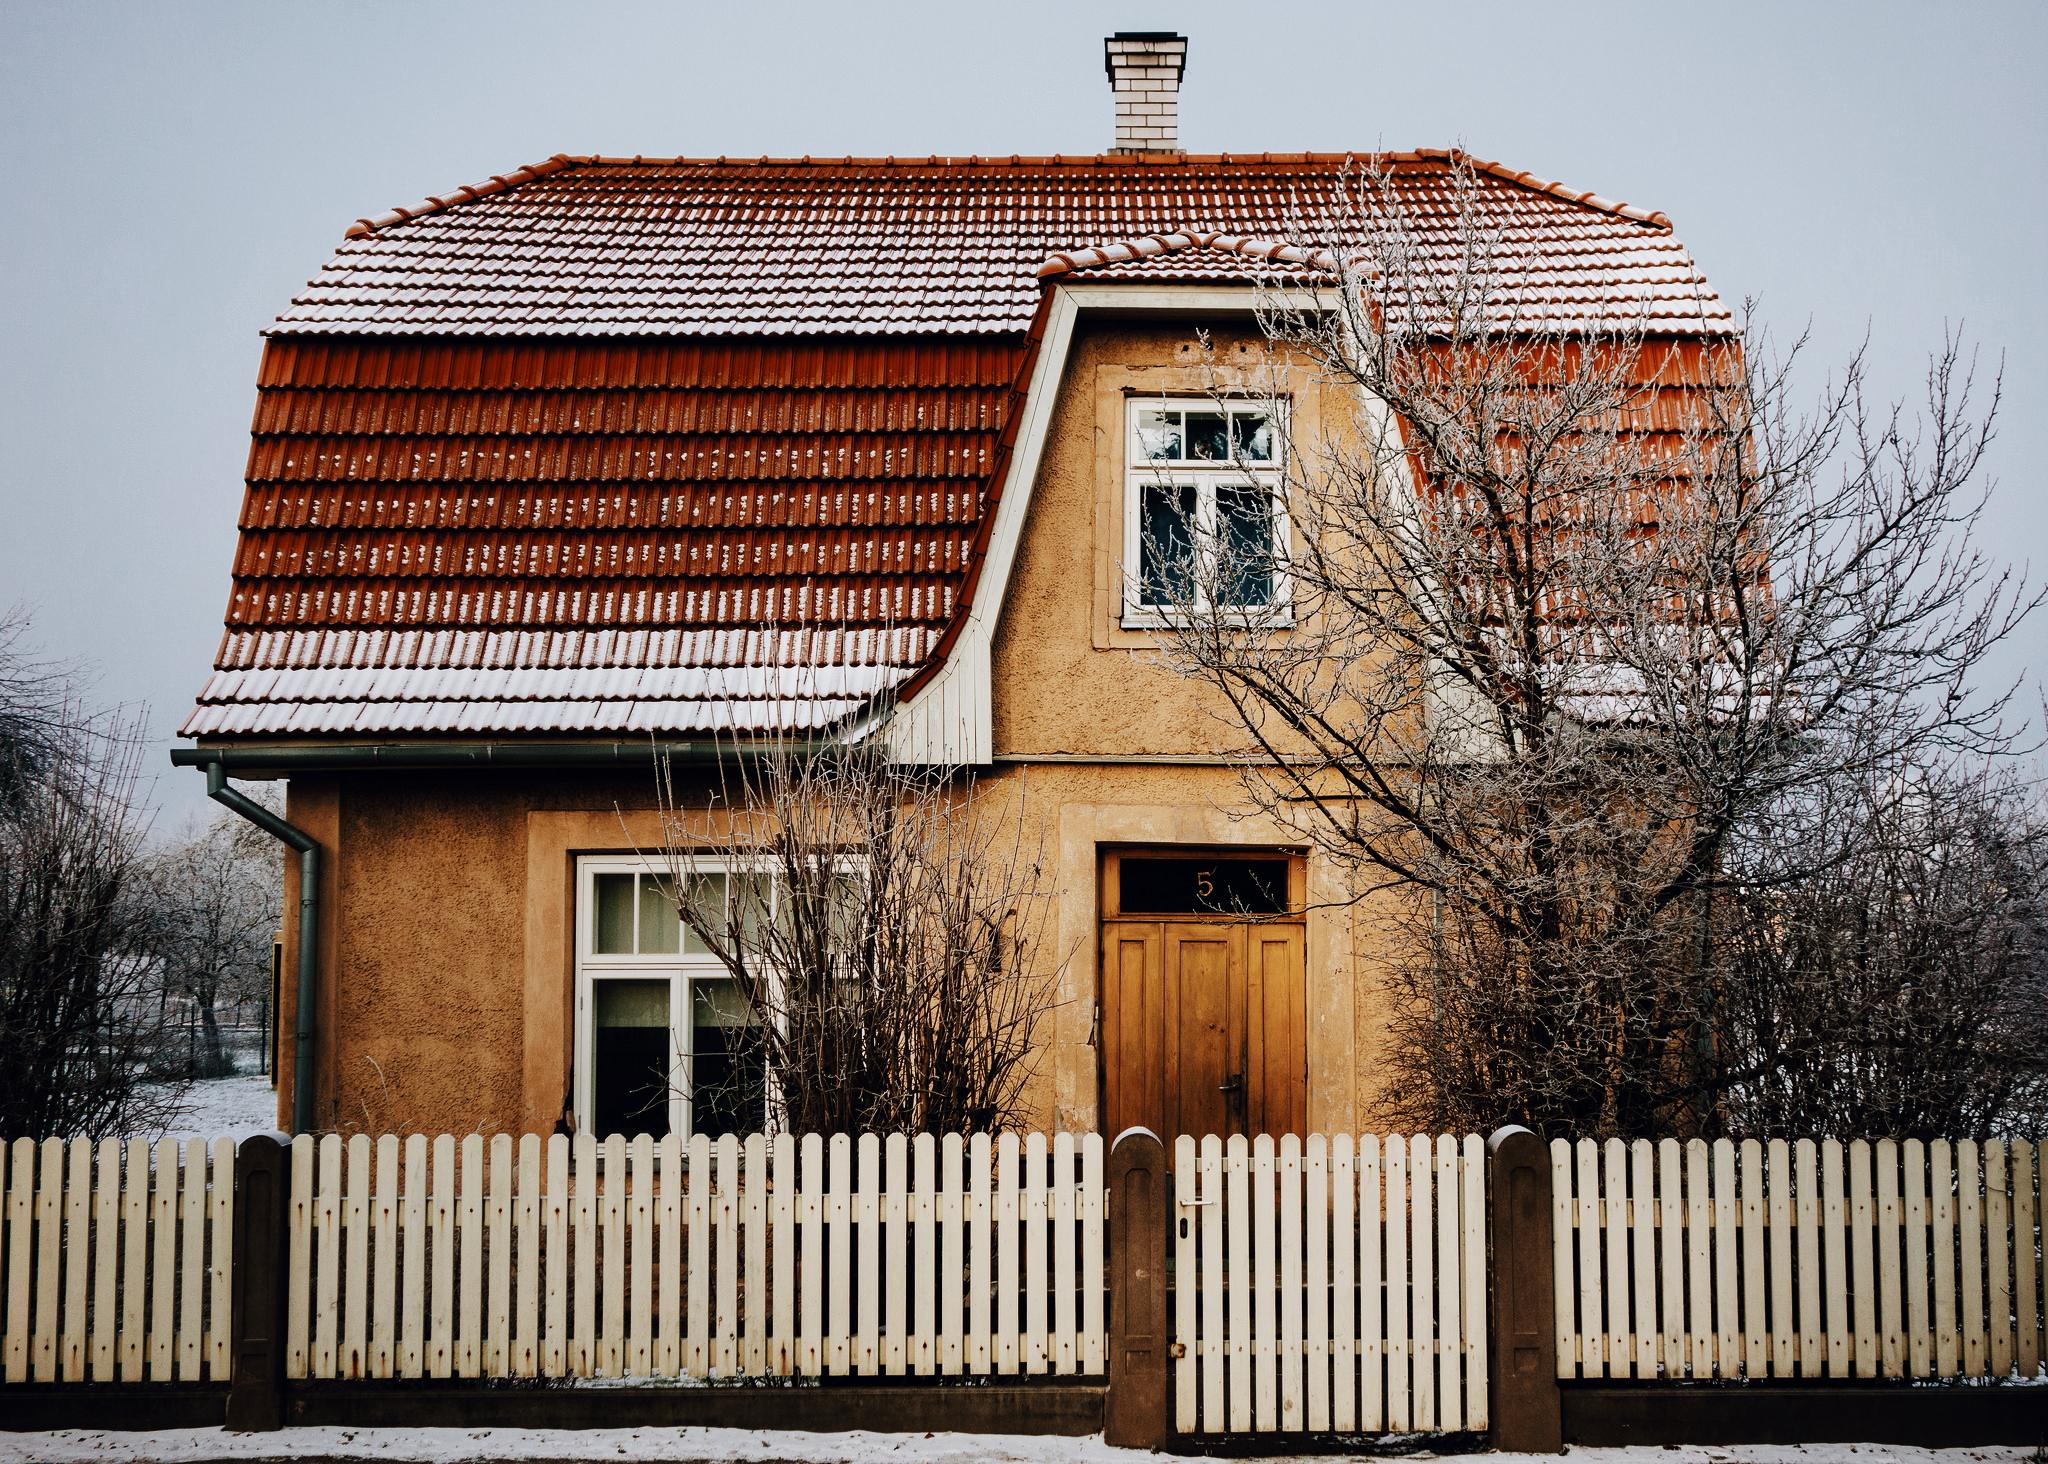 Maarjamõisa, Tartu, Estonia. December 2014.